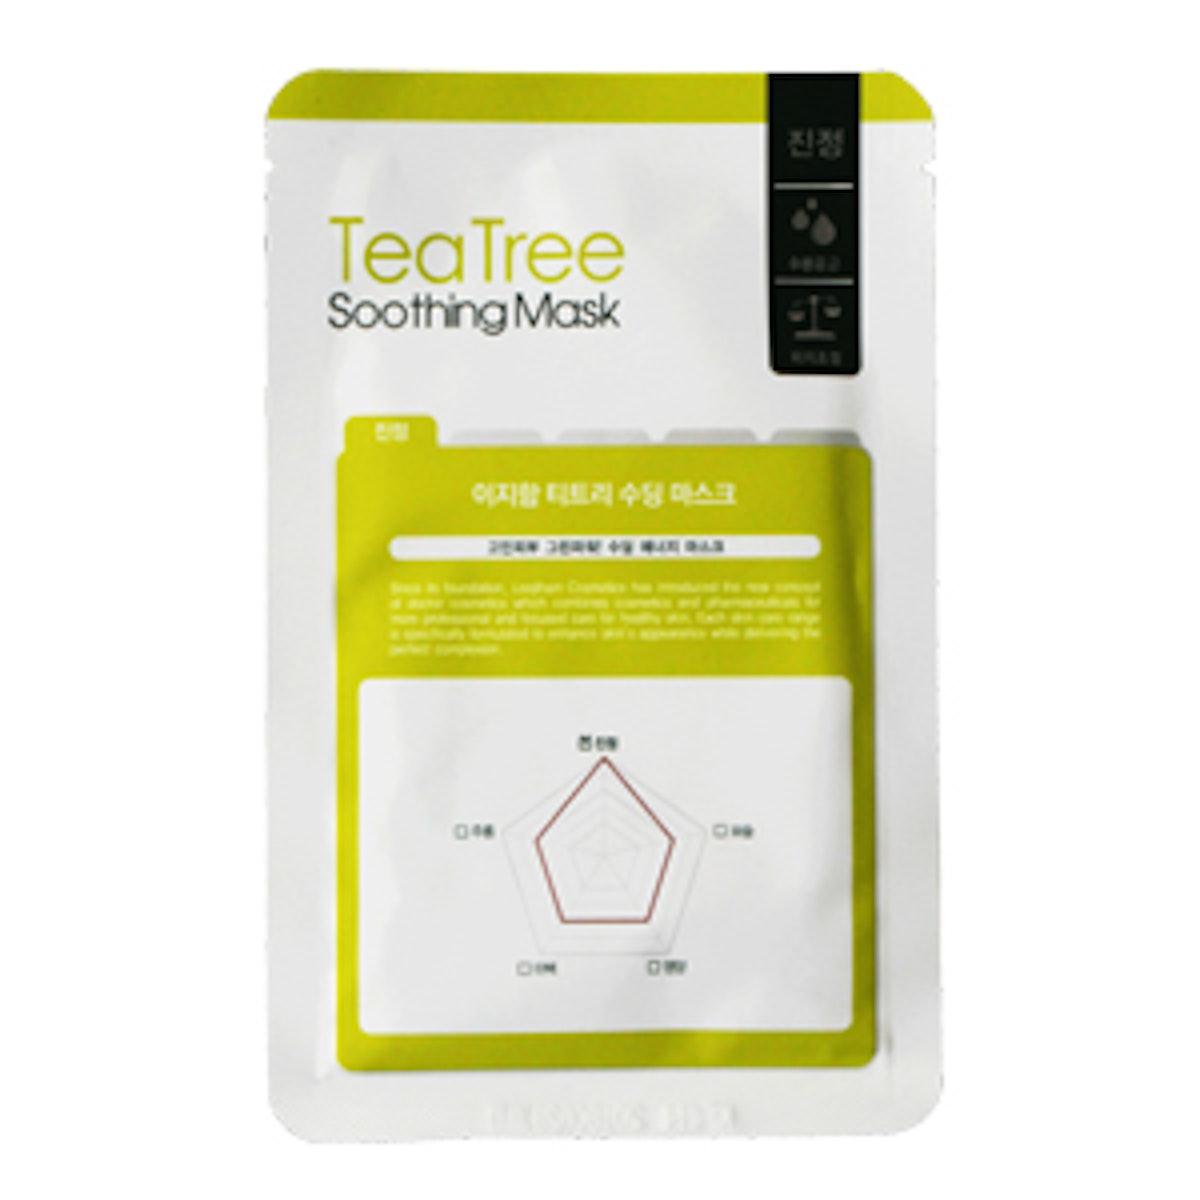 Tea Tree Soothing Mask